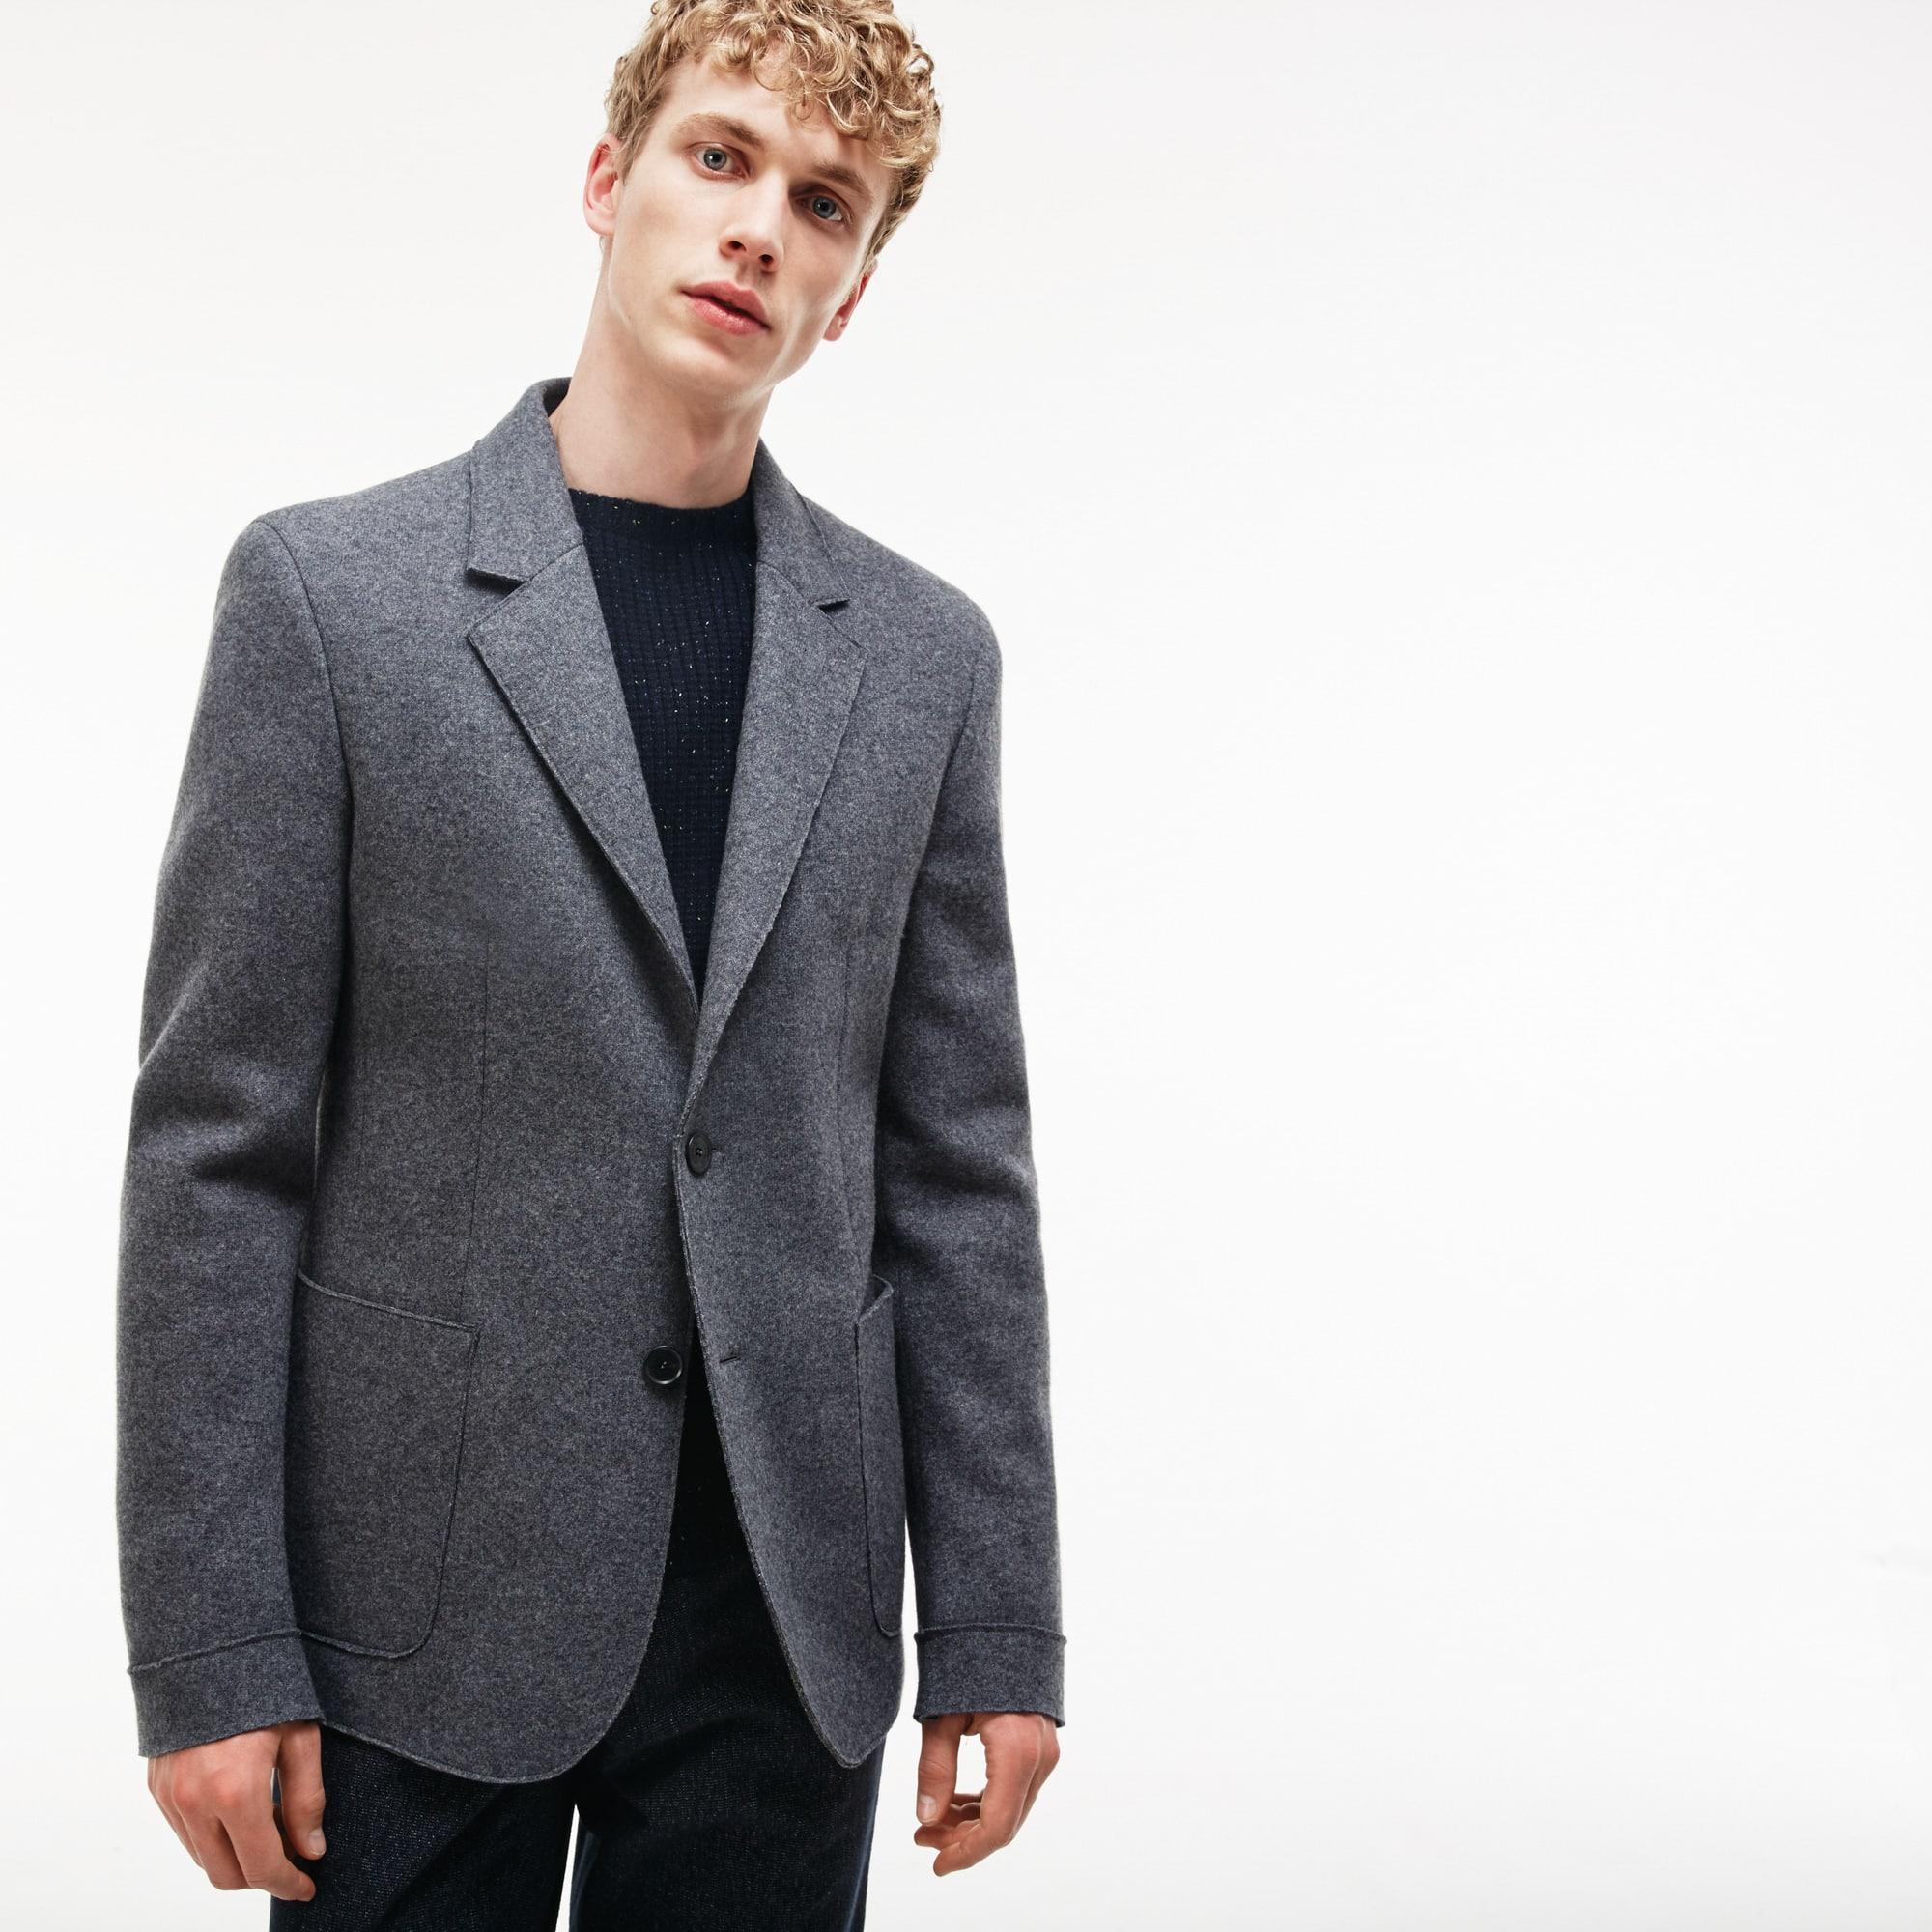 Men's Wool Broadcloth Suit Jacket